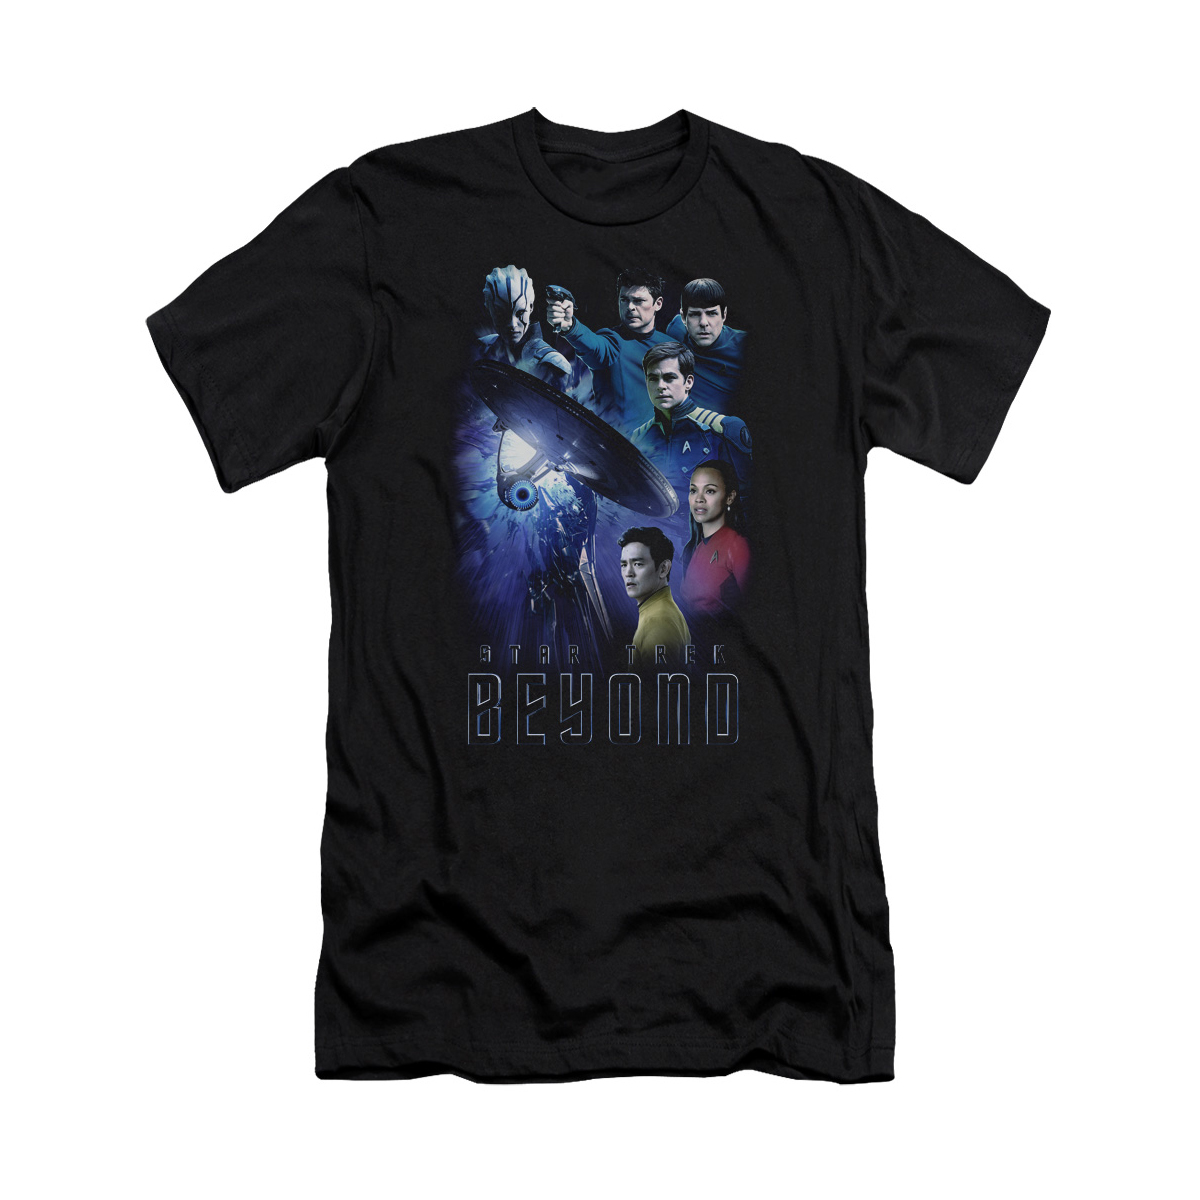 Star Trek Beyond Crew T-Shirt